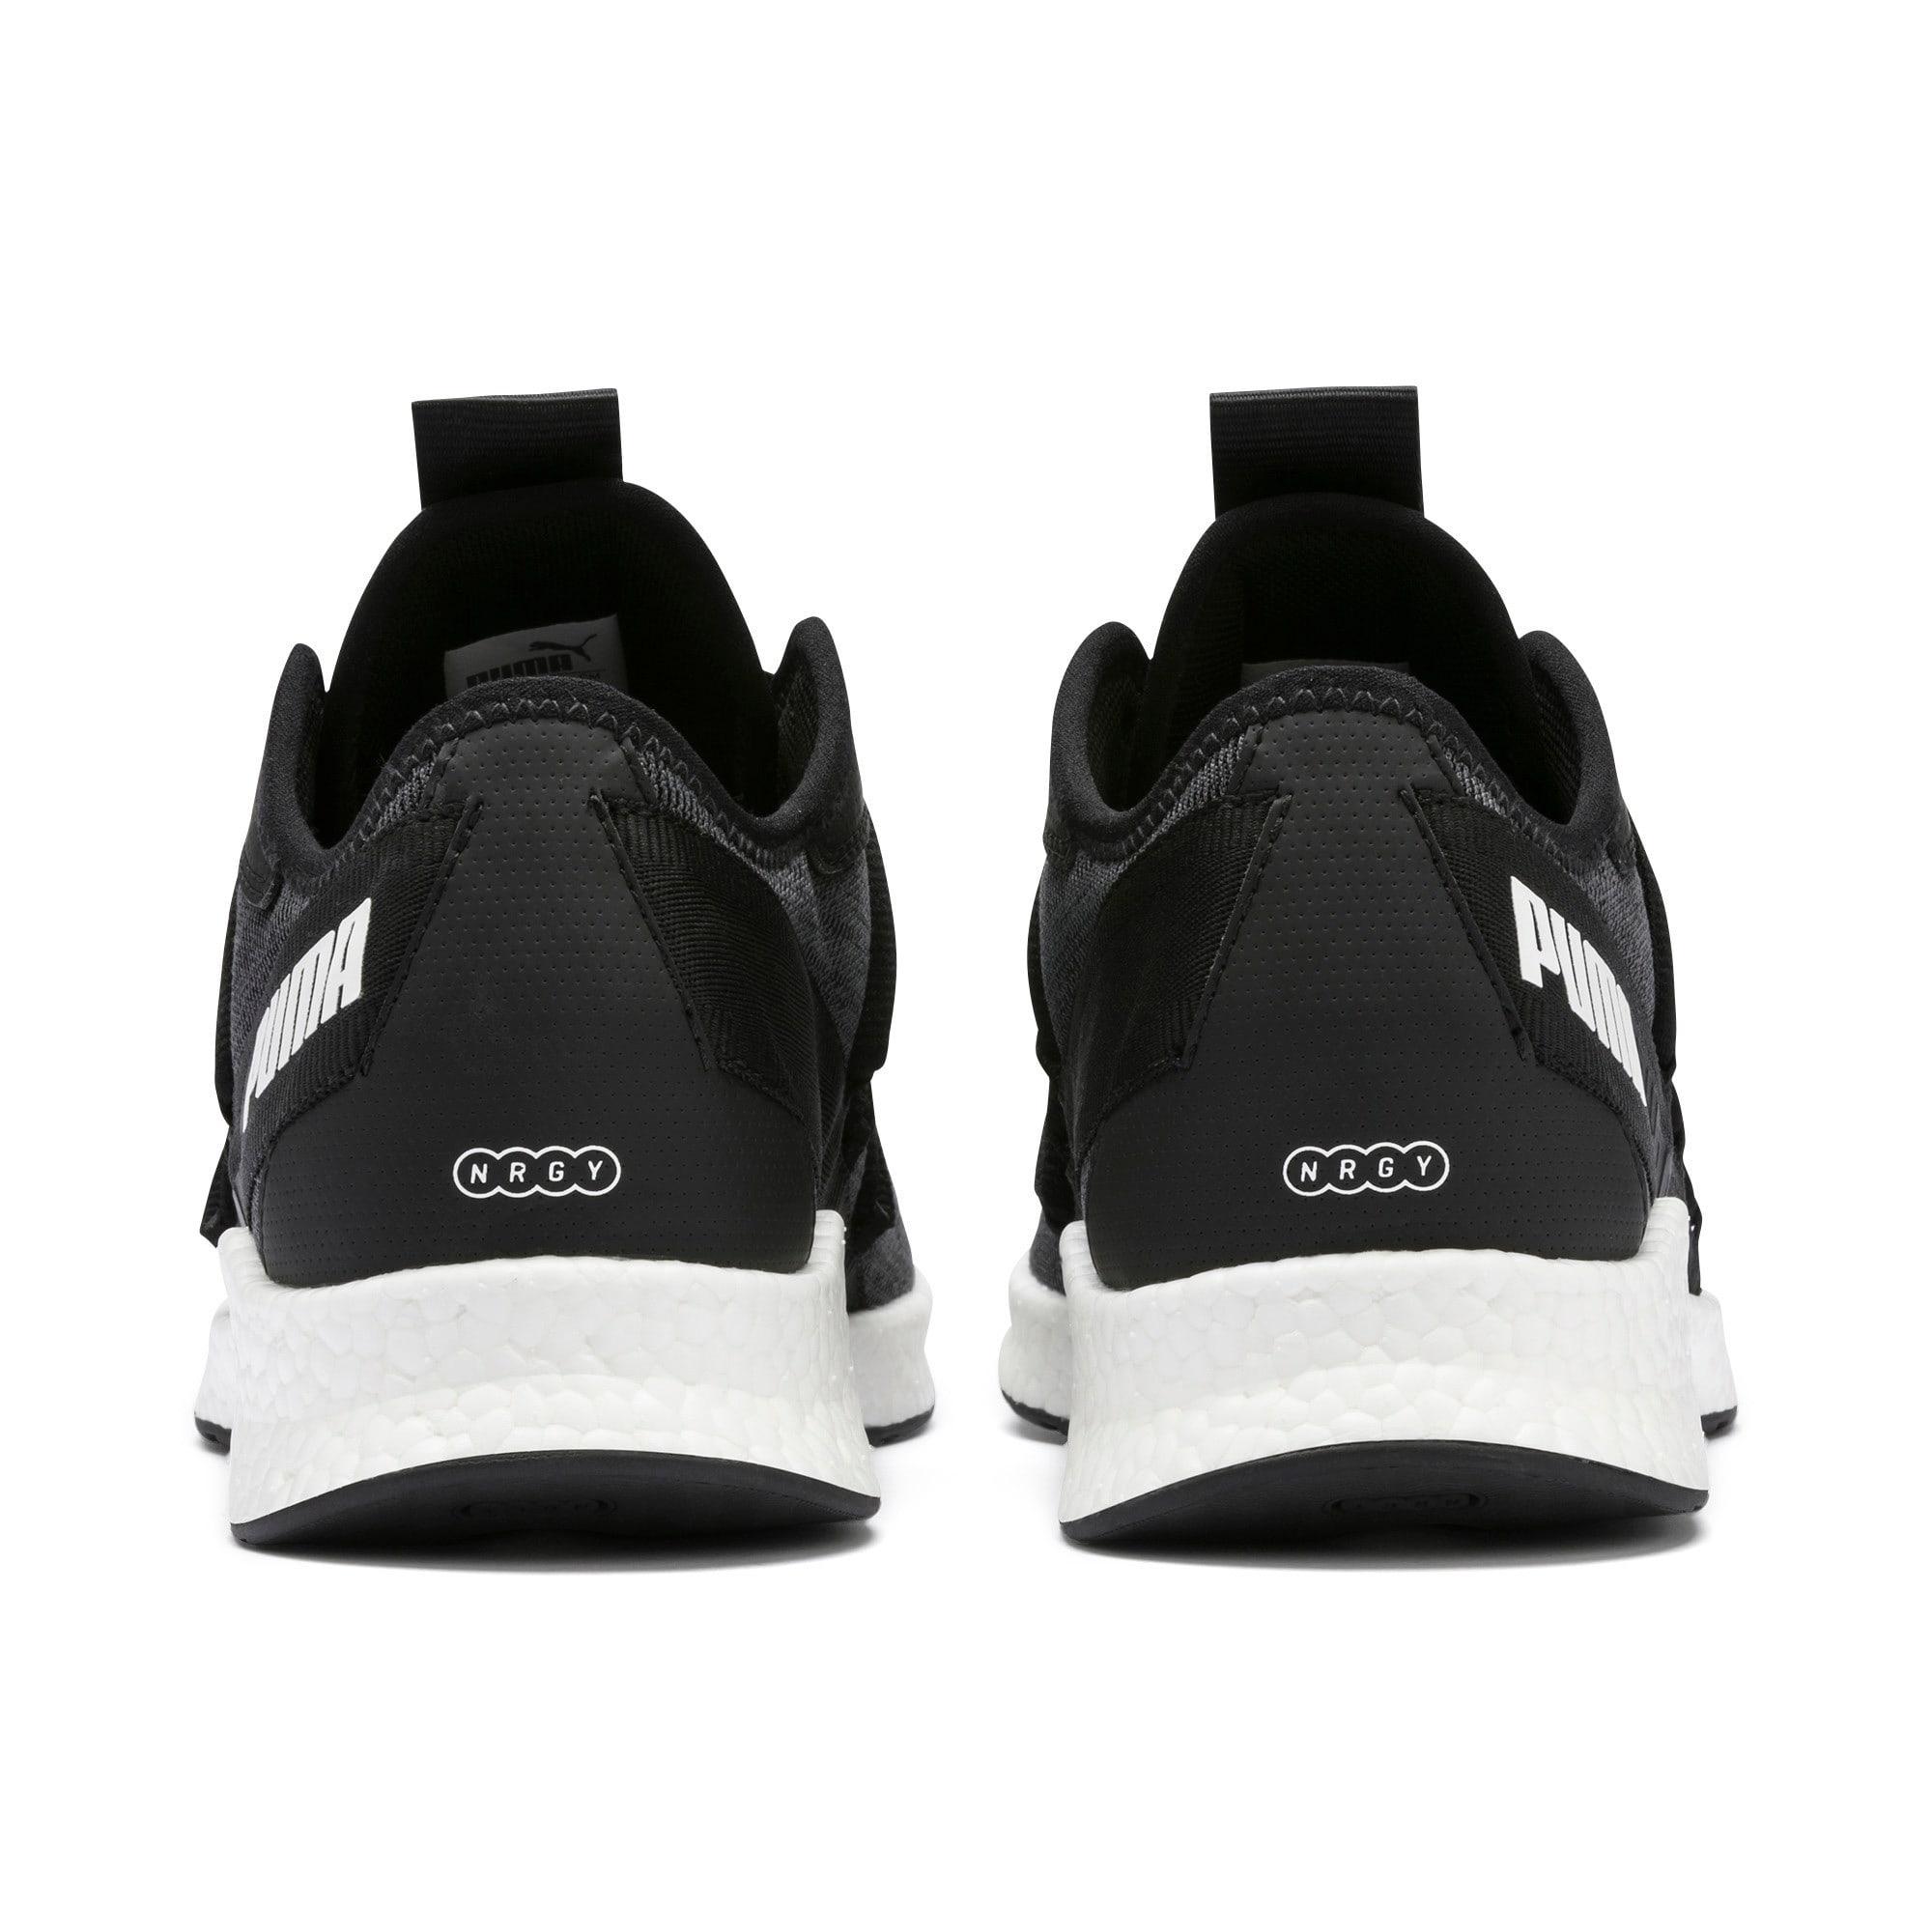 Thumbnail 4 of NRGY Star Knit Running Shoes, Puma Black-Puma White, medium